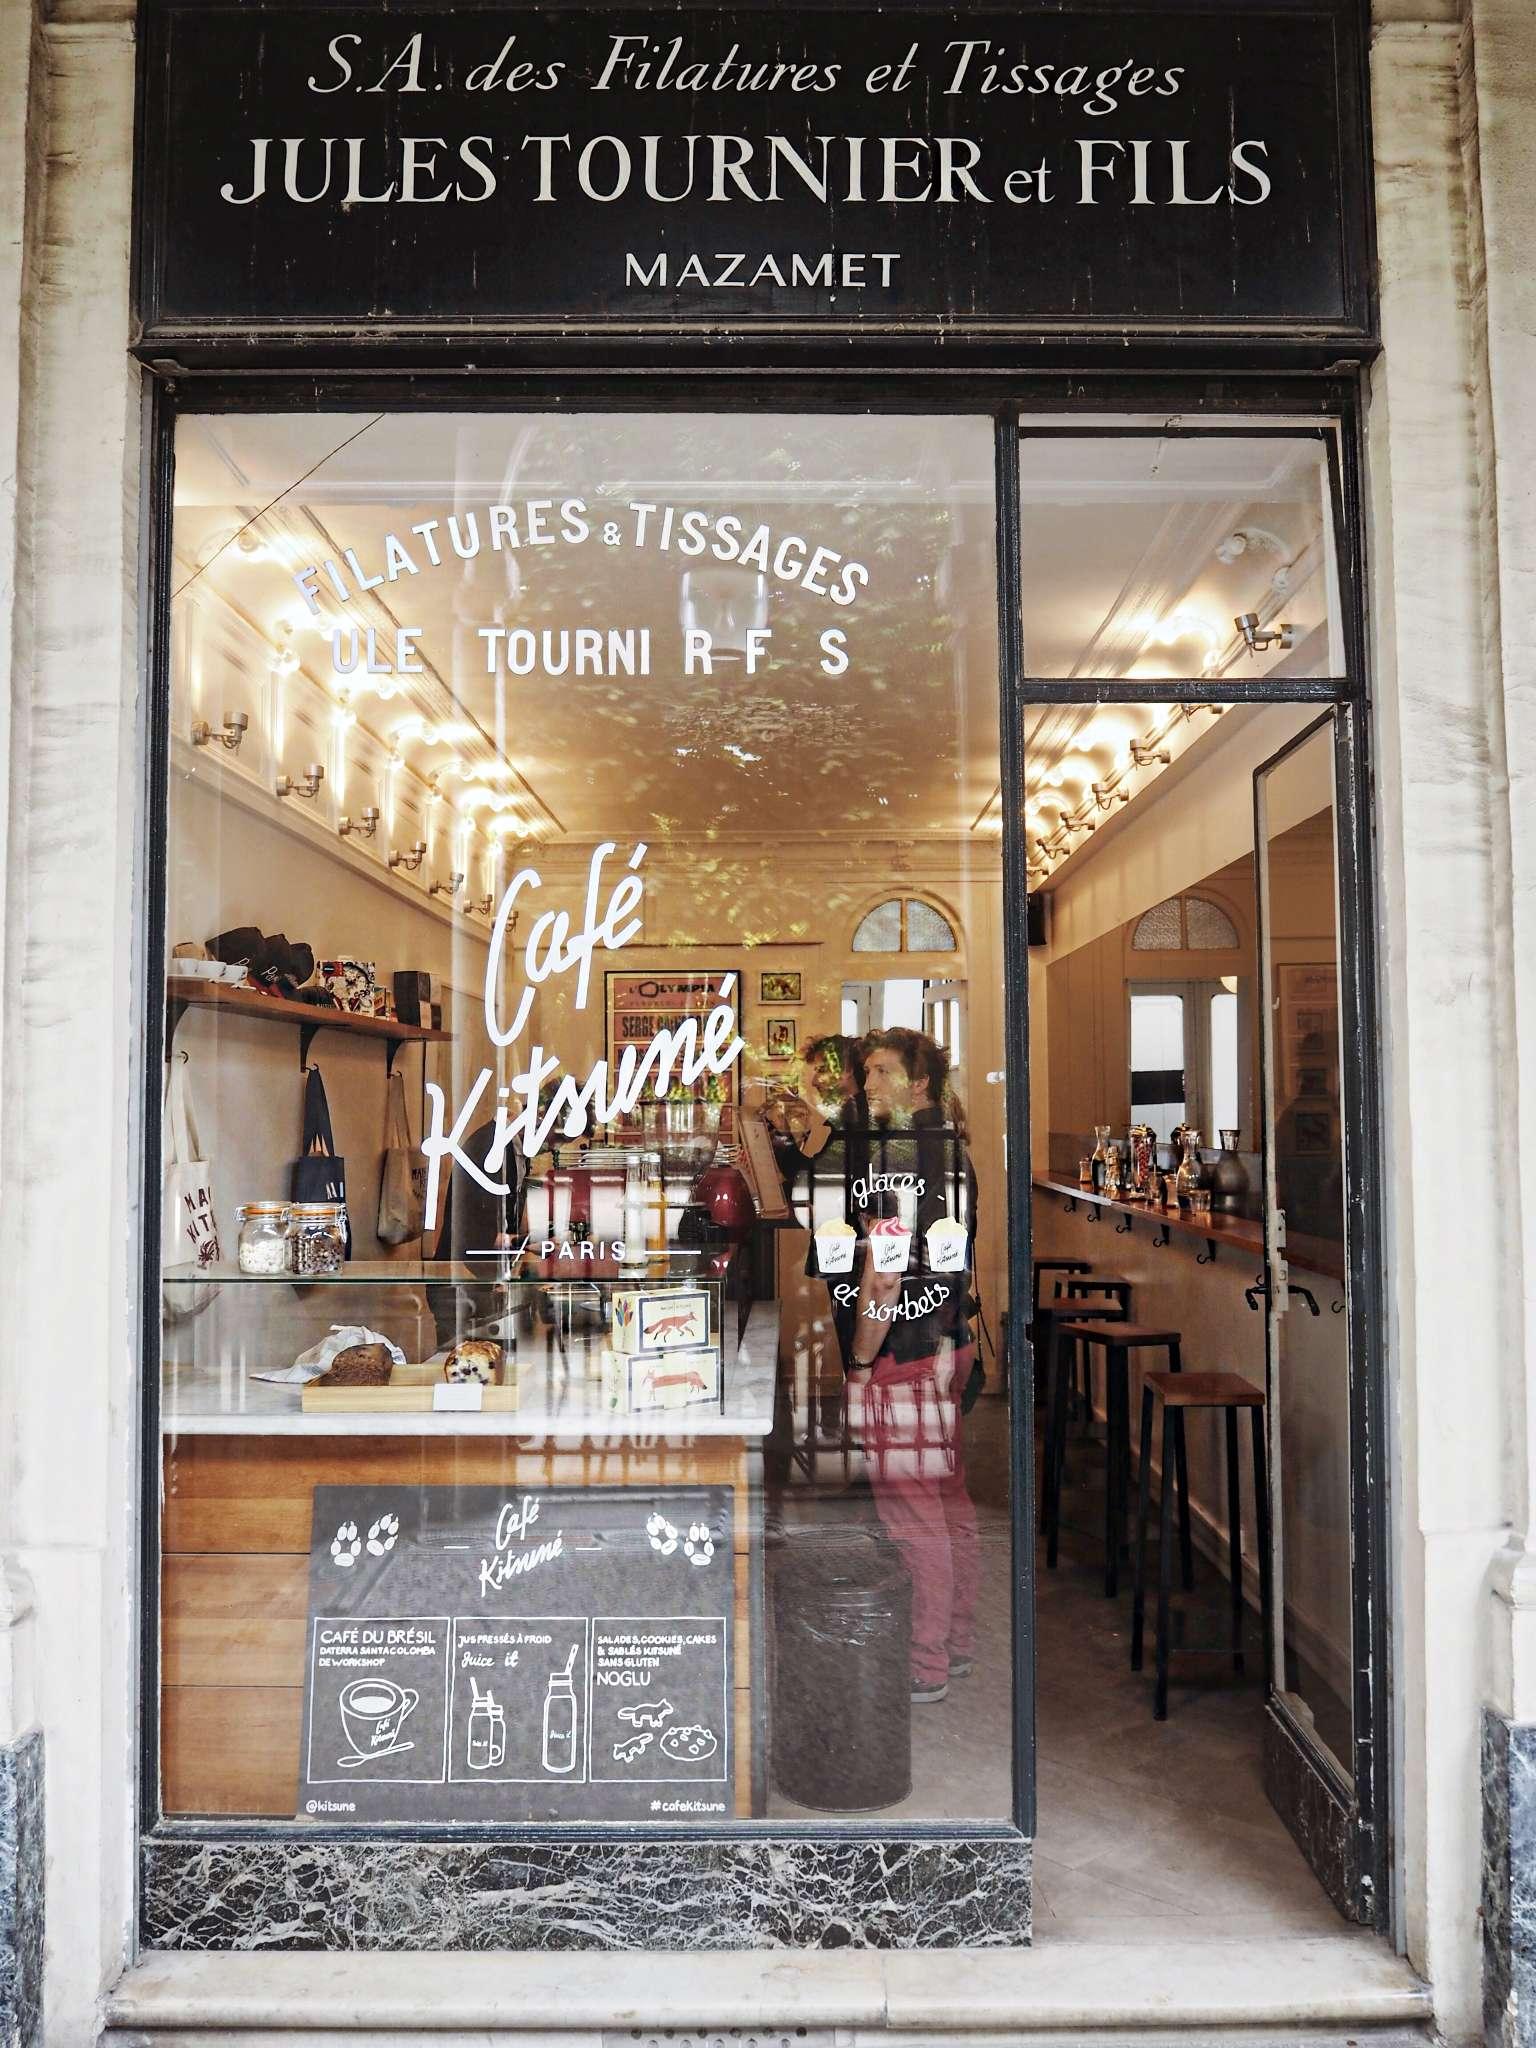 abbott-lyon-adidas-stan-smith-cafe-de-flore-cafe-kitsune-clarks-hotel-costes-hotel-opera-faubourg-paris-irena-chmura-laduree-Levi's-oneteaspoon-overall-palais-royal-paris-paris-guide-parisian-balcony-ralph-ralph-lauren-stgermain-takko-tommy-hilfiger